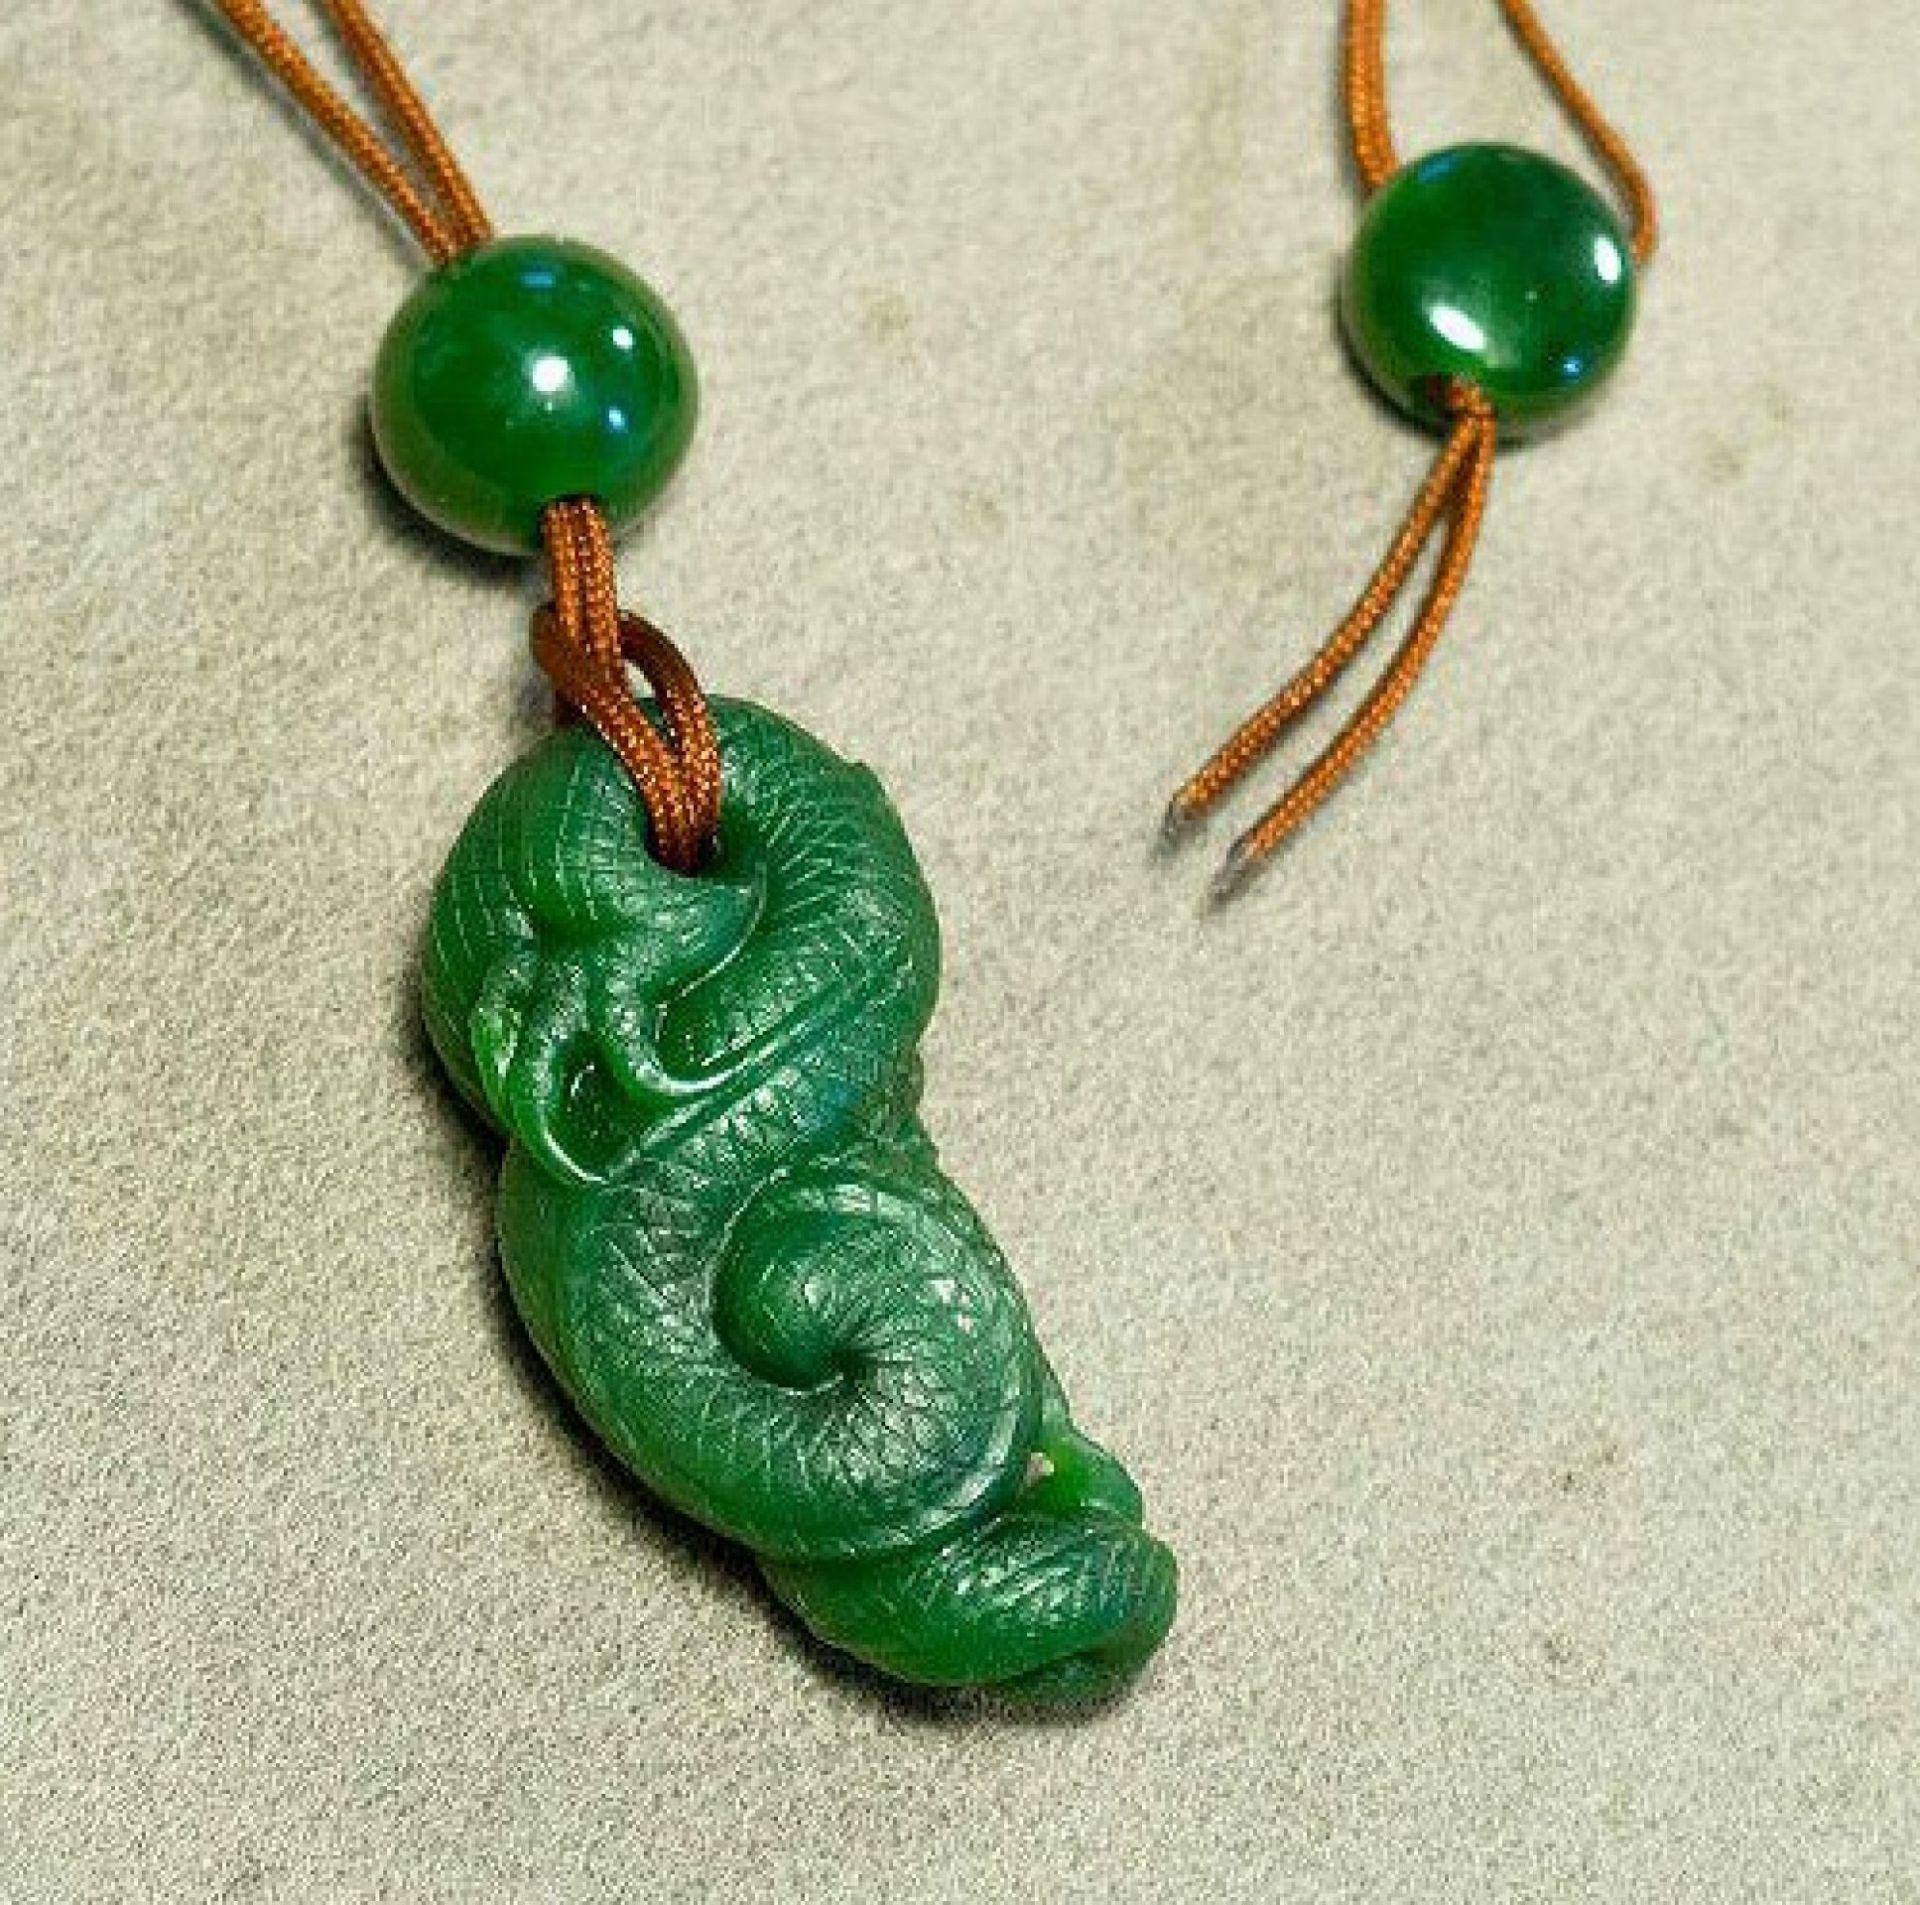 Dragon Jadeite Magatama Nephrite Pendant by Legend Gemstone Sculpture Carved